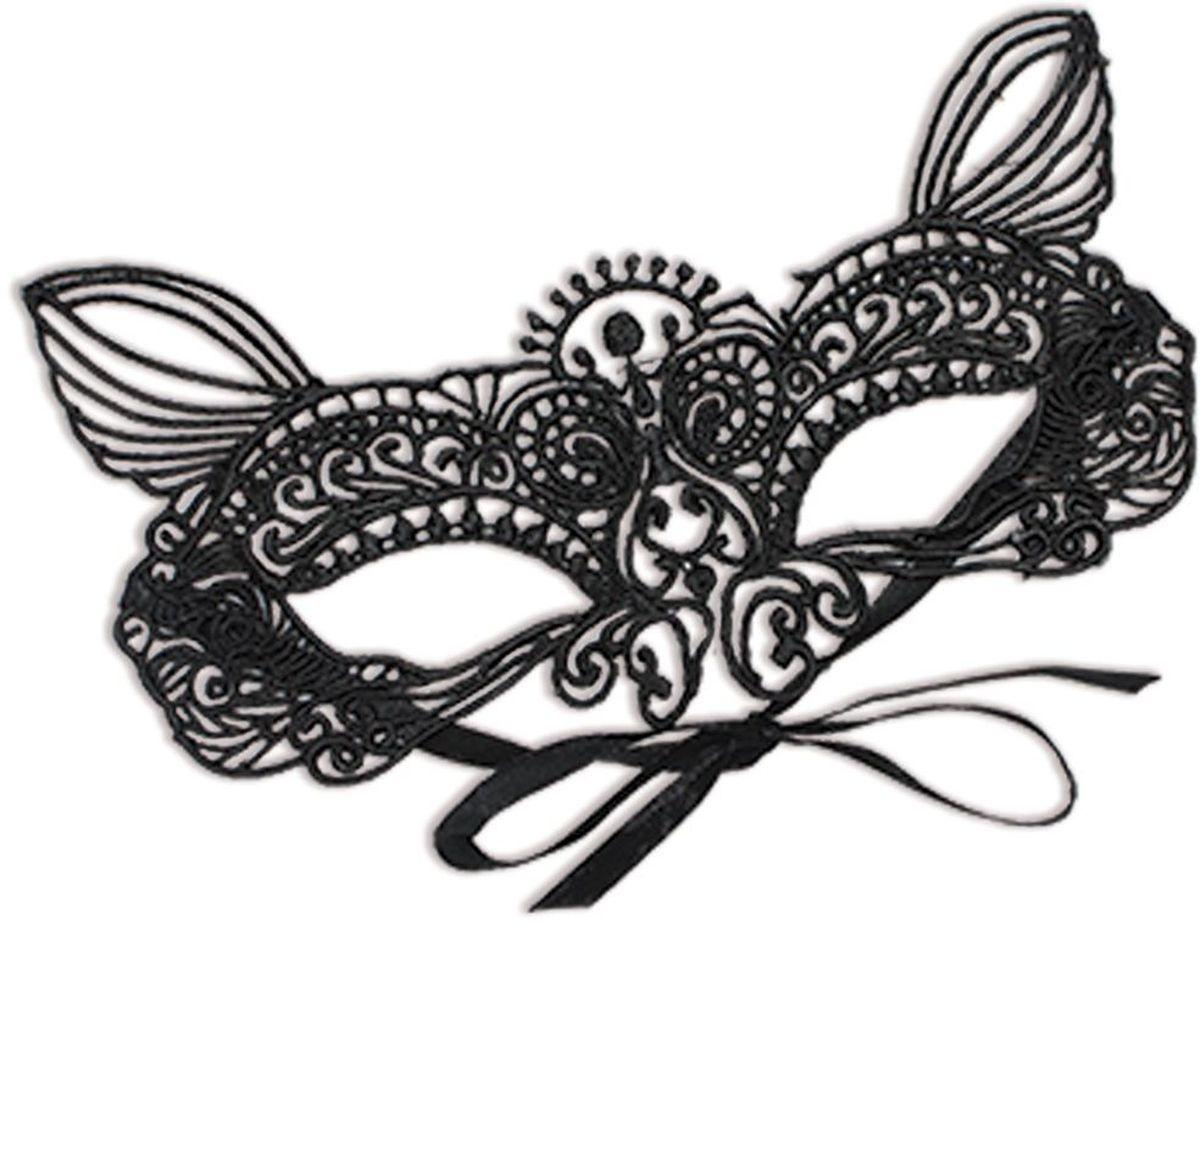 Partymania Карнавальная маска Кружево T1228 цвет 4